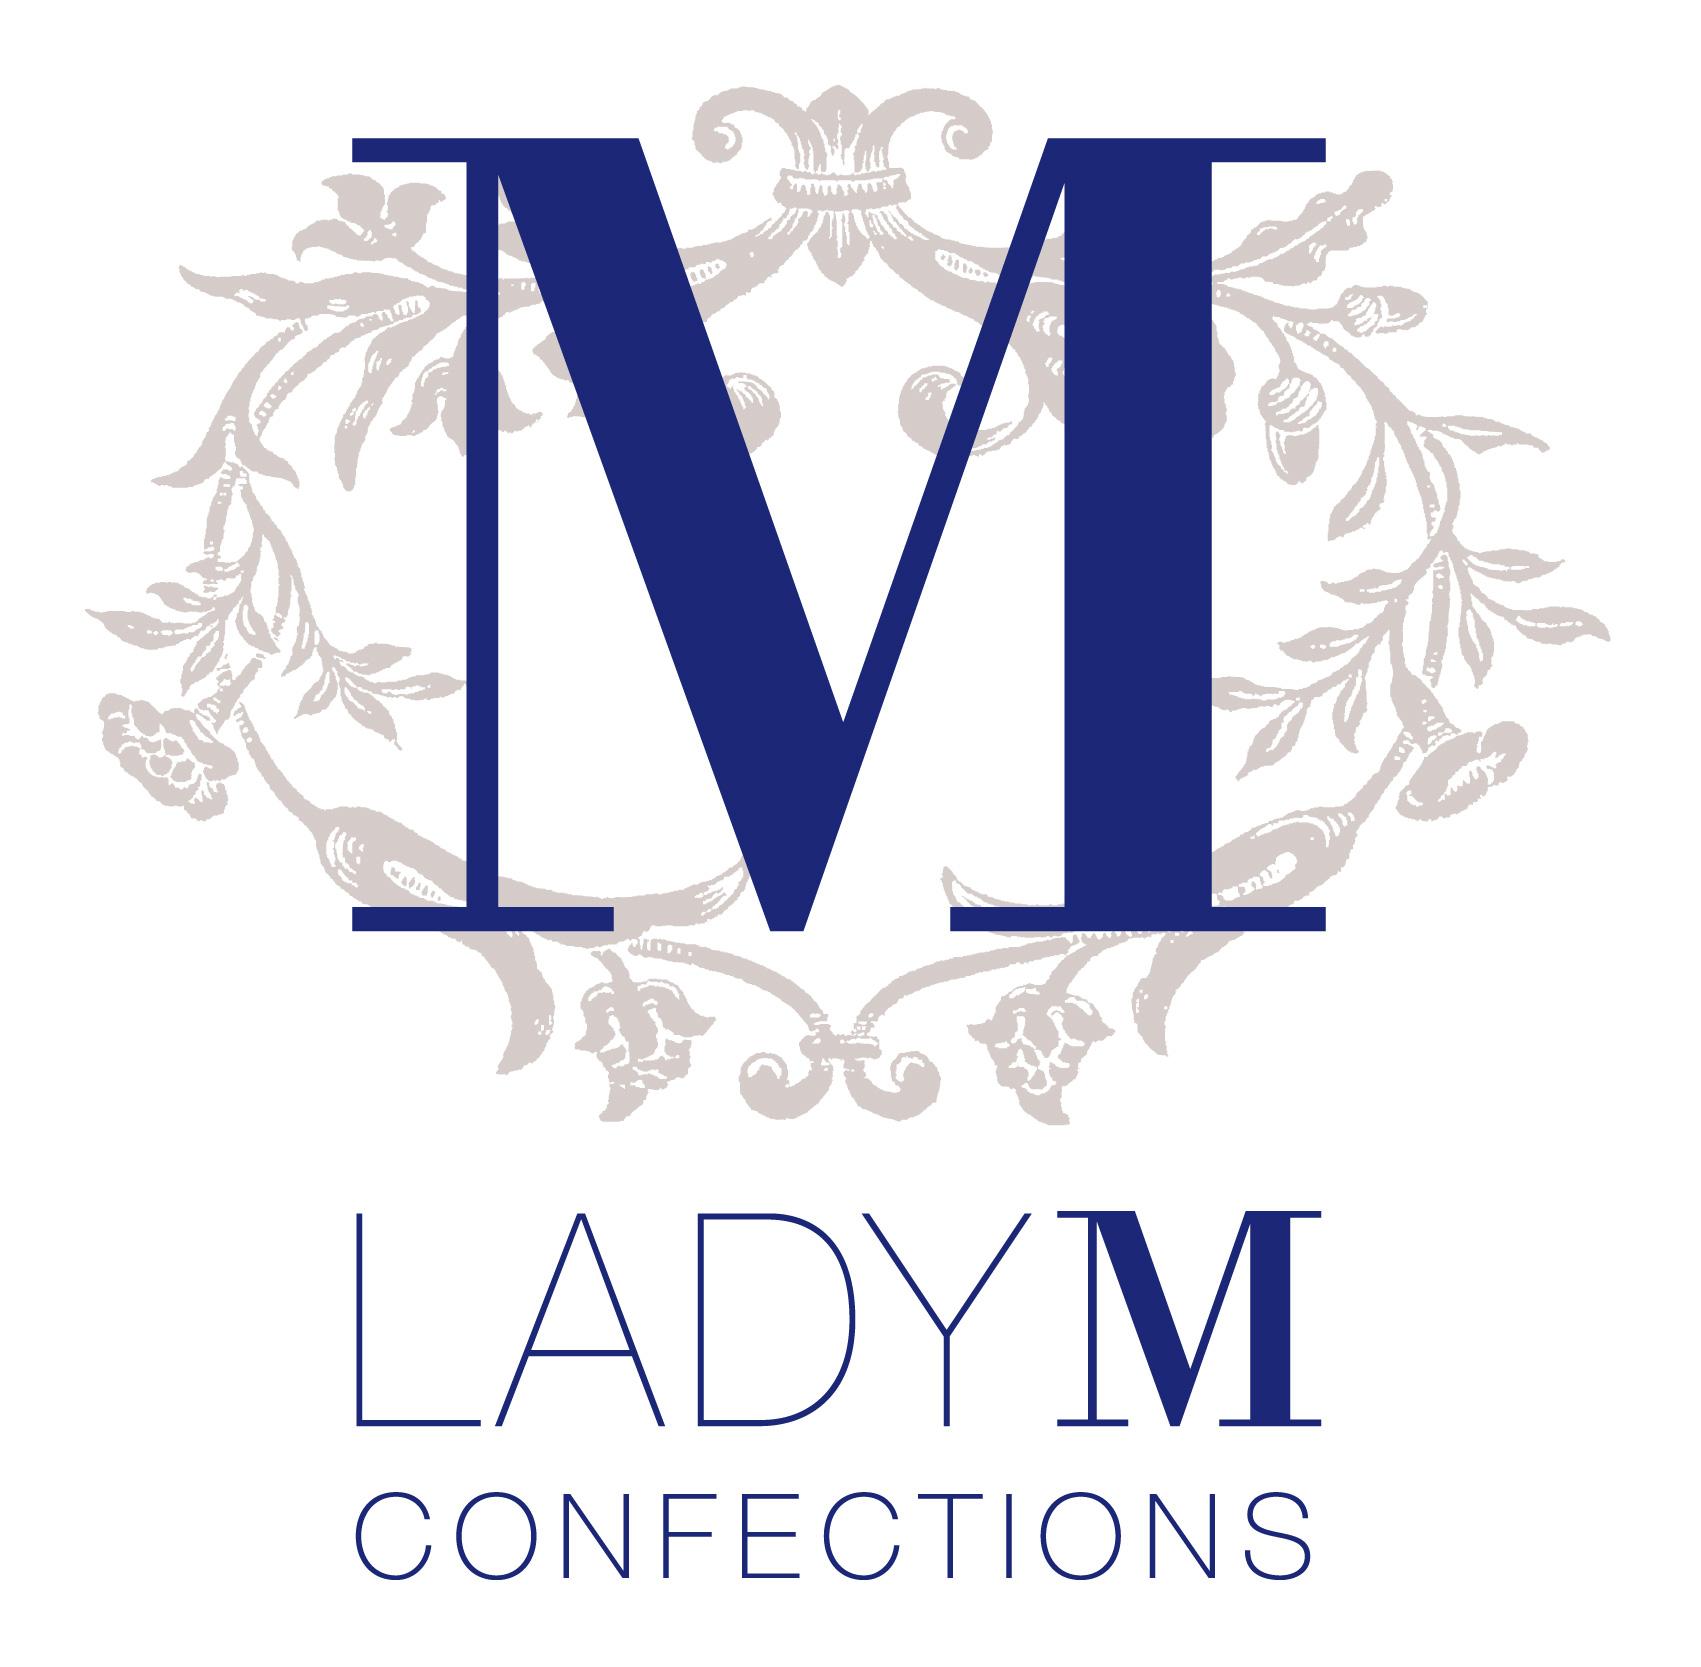 ladym_confections.jpg